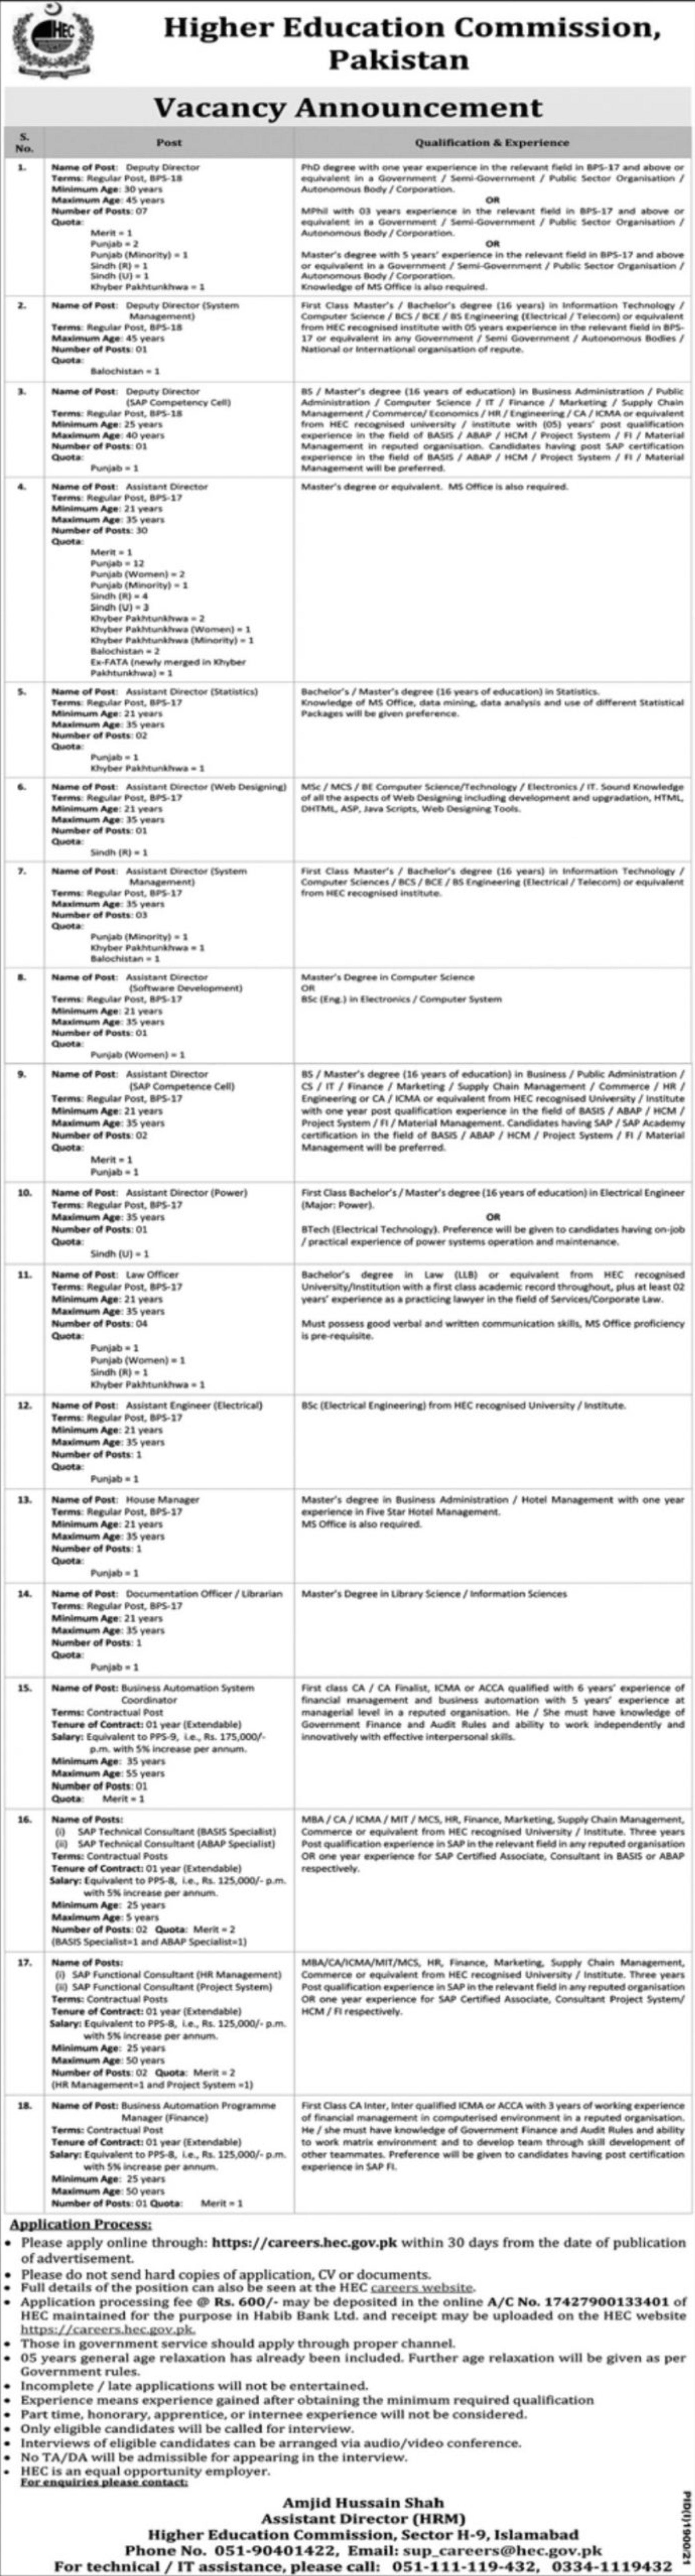 Higher Education Commission HEC Pakistan Vacancies 2021 – Latest Jobs 3